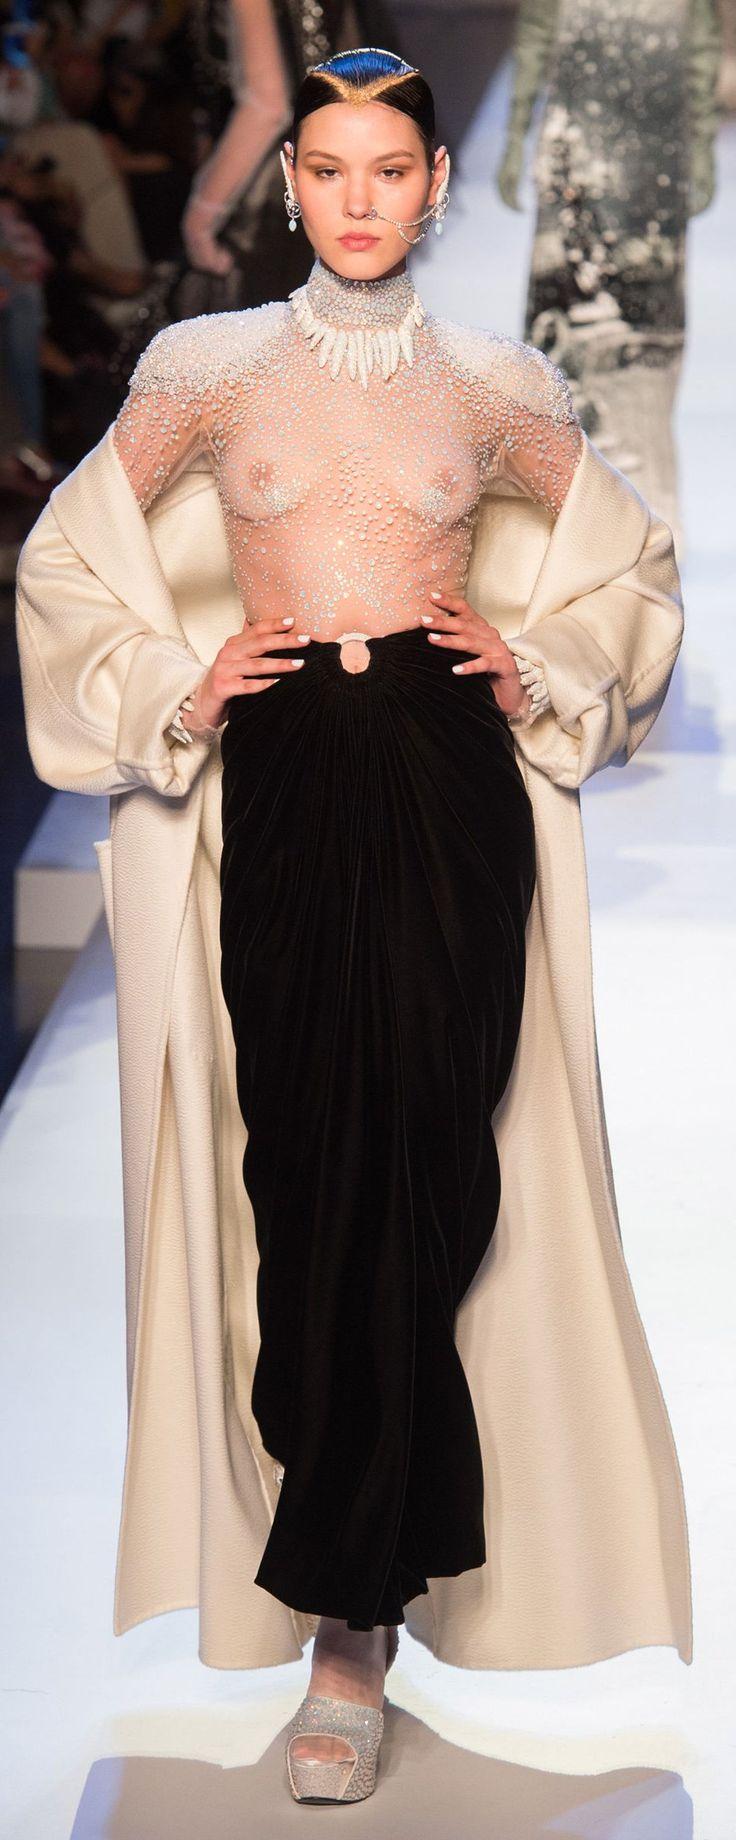 Jean Paul Gaultier Fall-winter 2017-2018 - Couture - http://www.orientpalms.com/Jean-Paul-Gaultier-6840 - ©ImaxTree